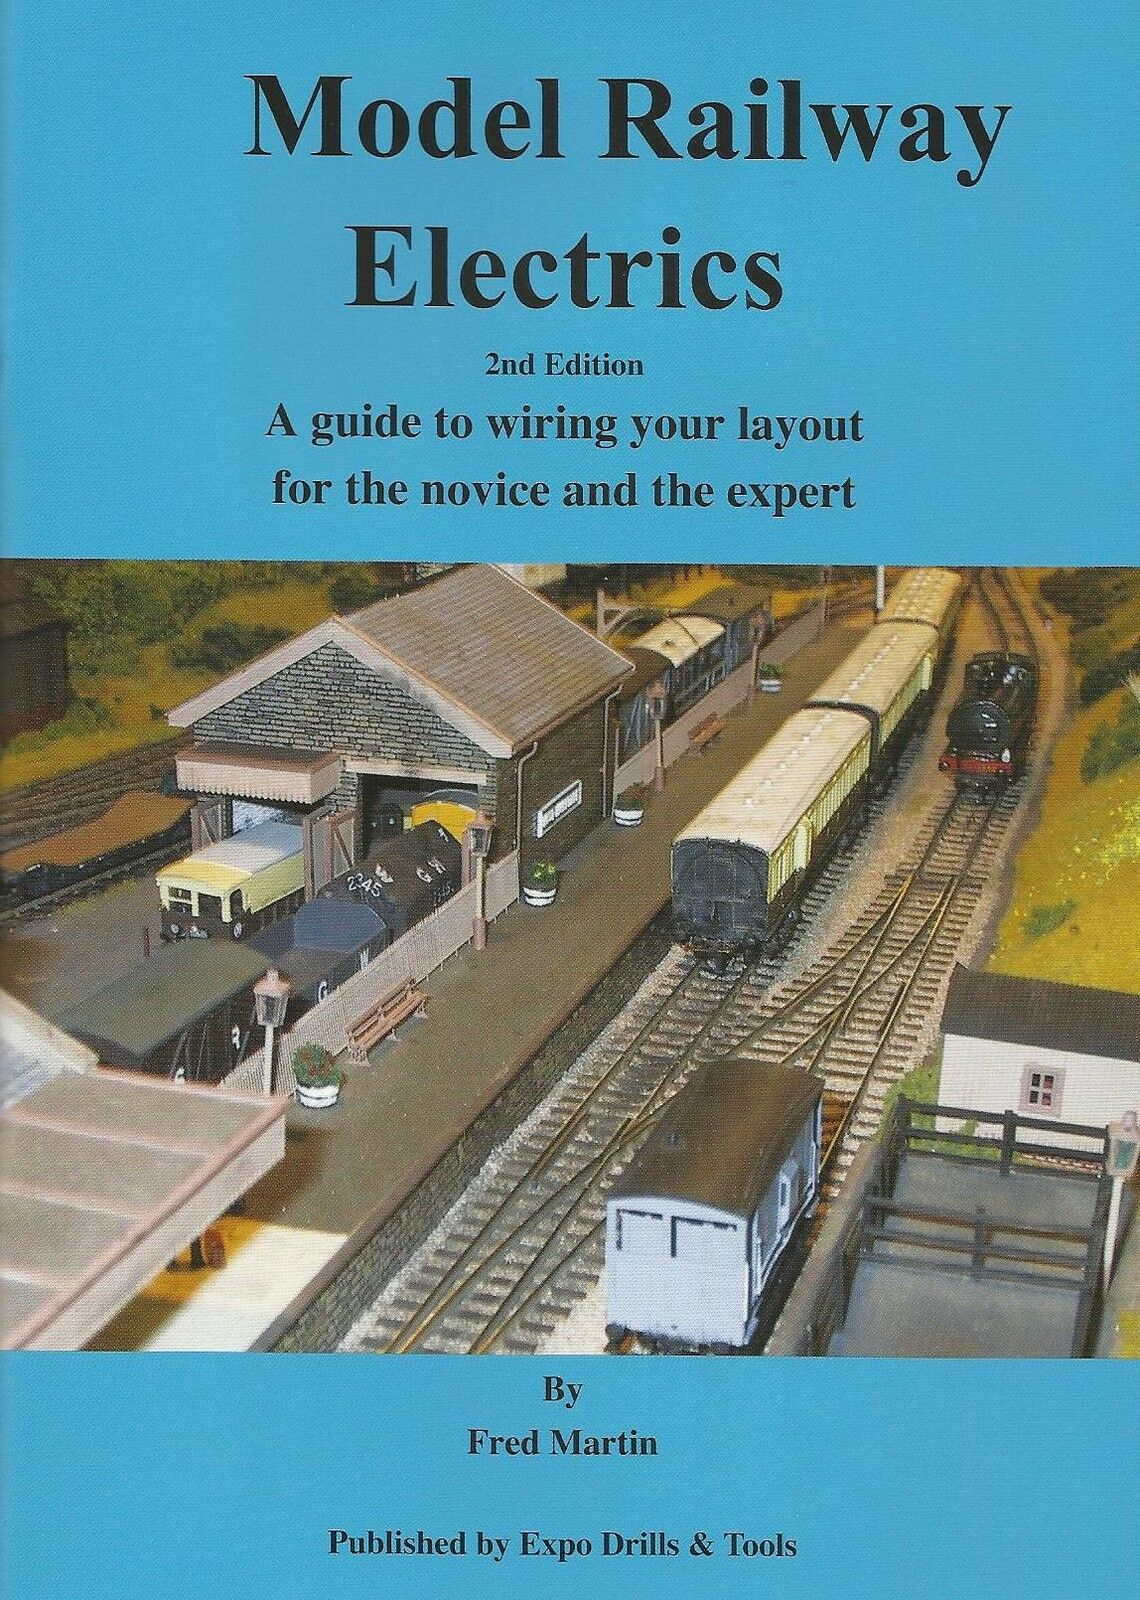 Expo 27999 Model Railway Electrics & Wiring Guide Book | eBay